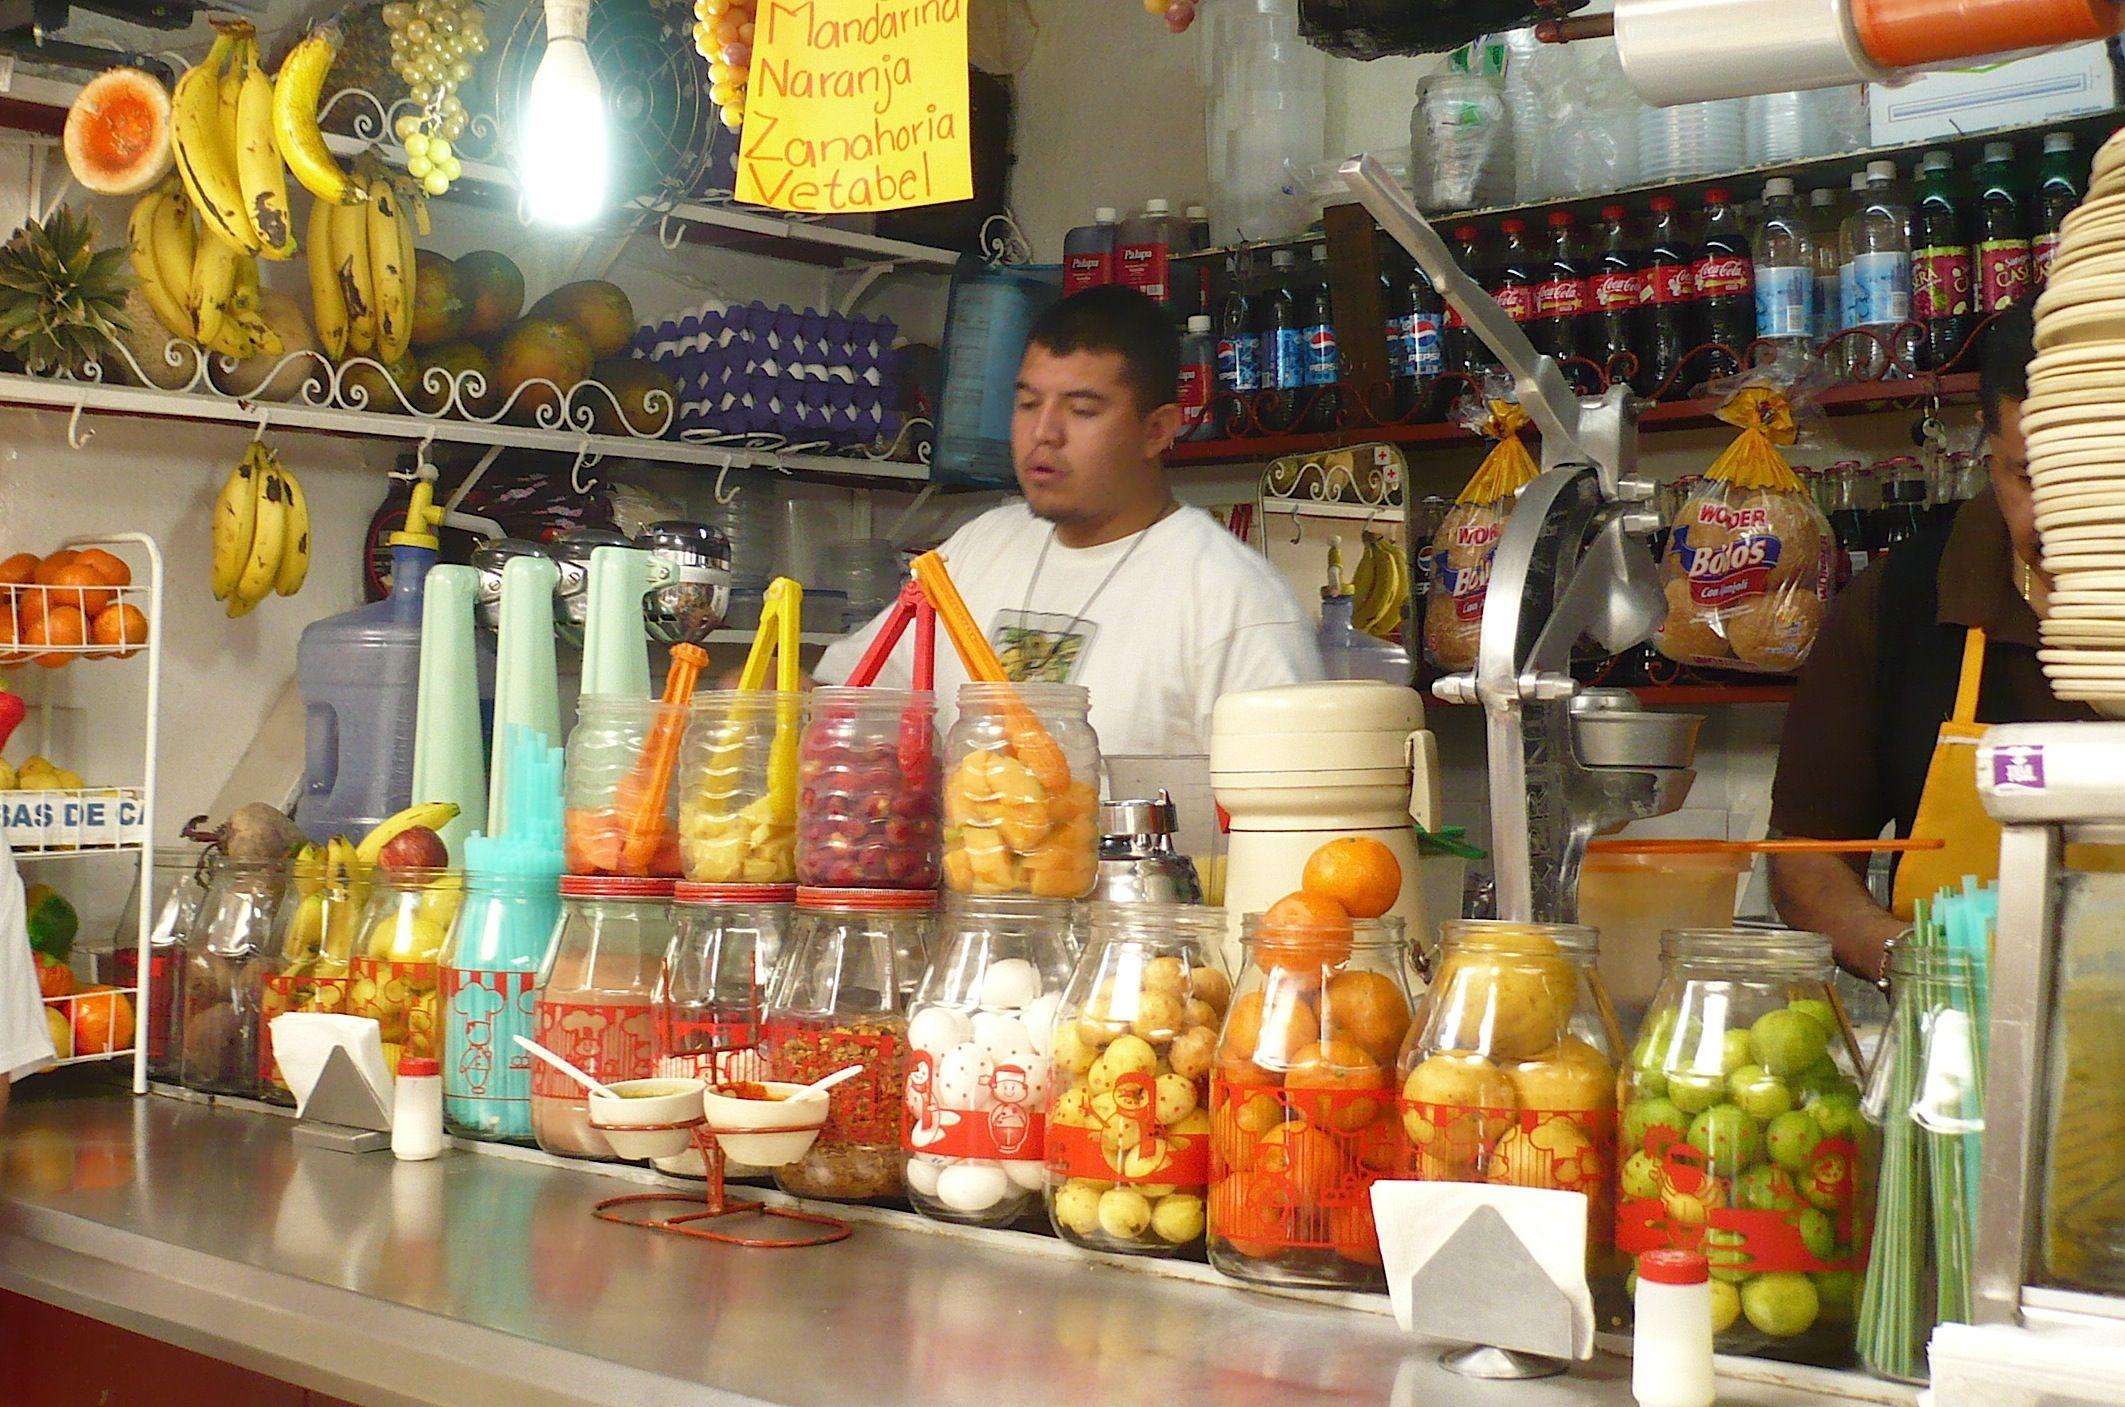 eating at mexican markets - Buscar con Google